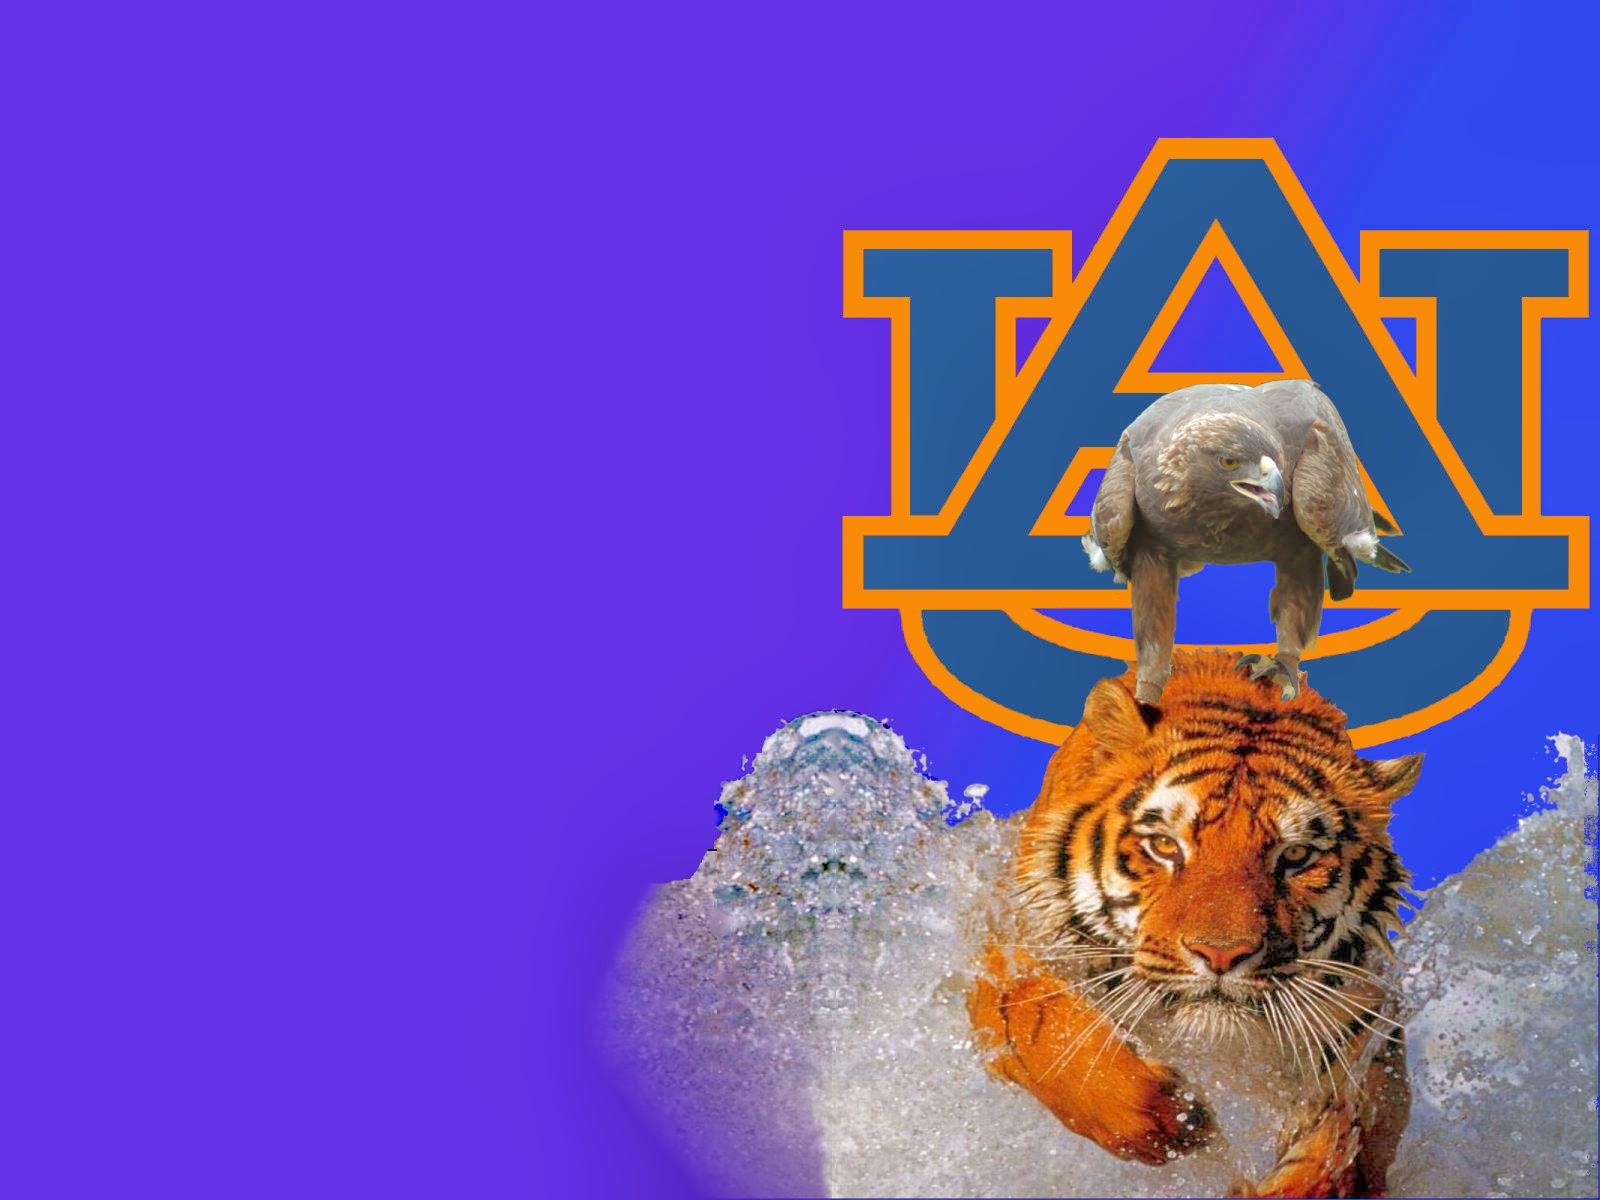 wallpaper and make this Auburn football wallpaper for your desktop 1600x1200